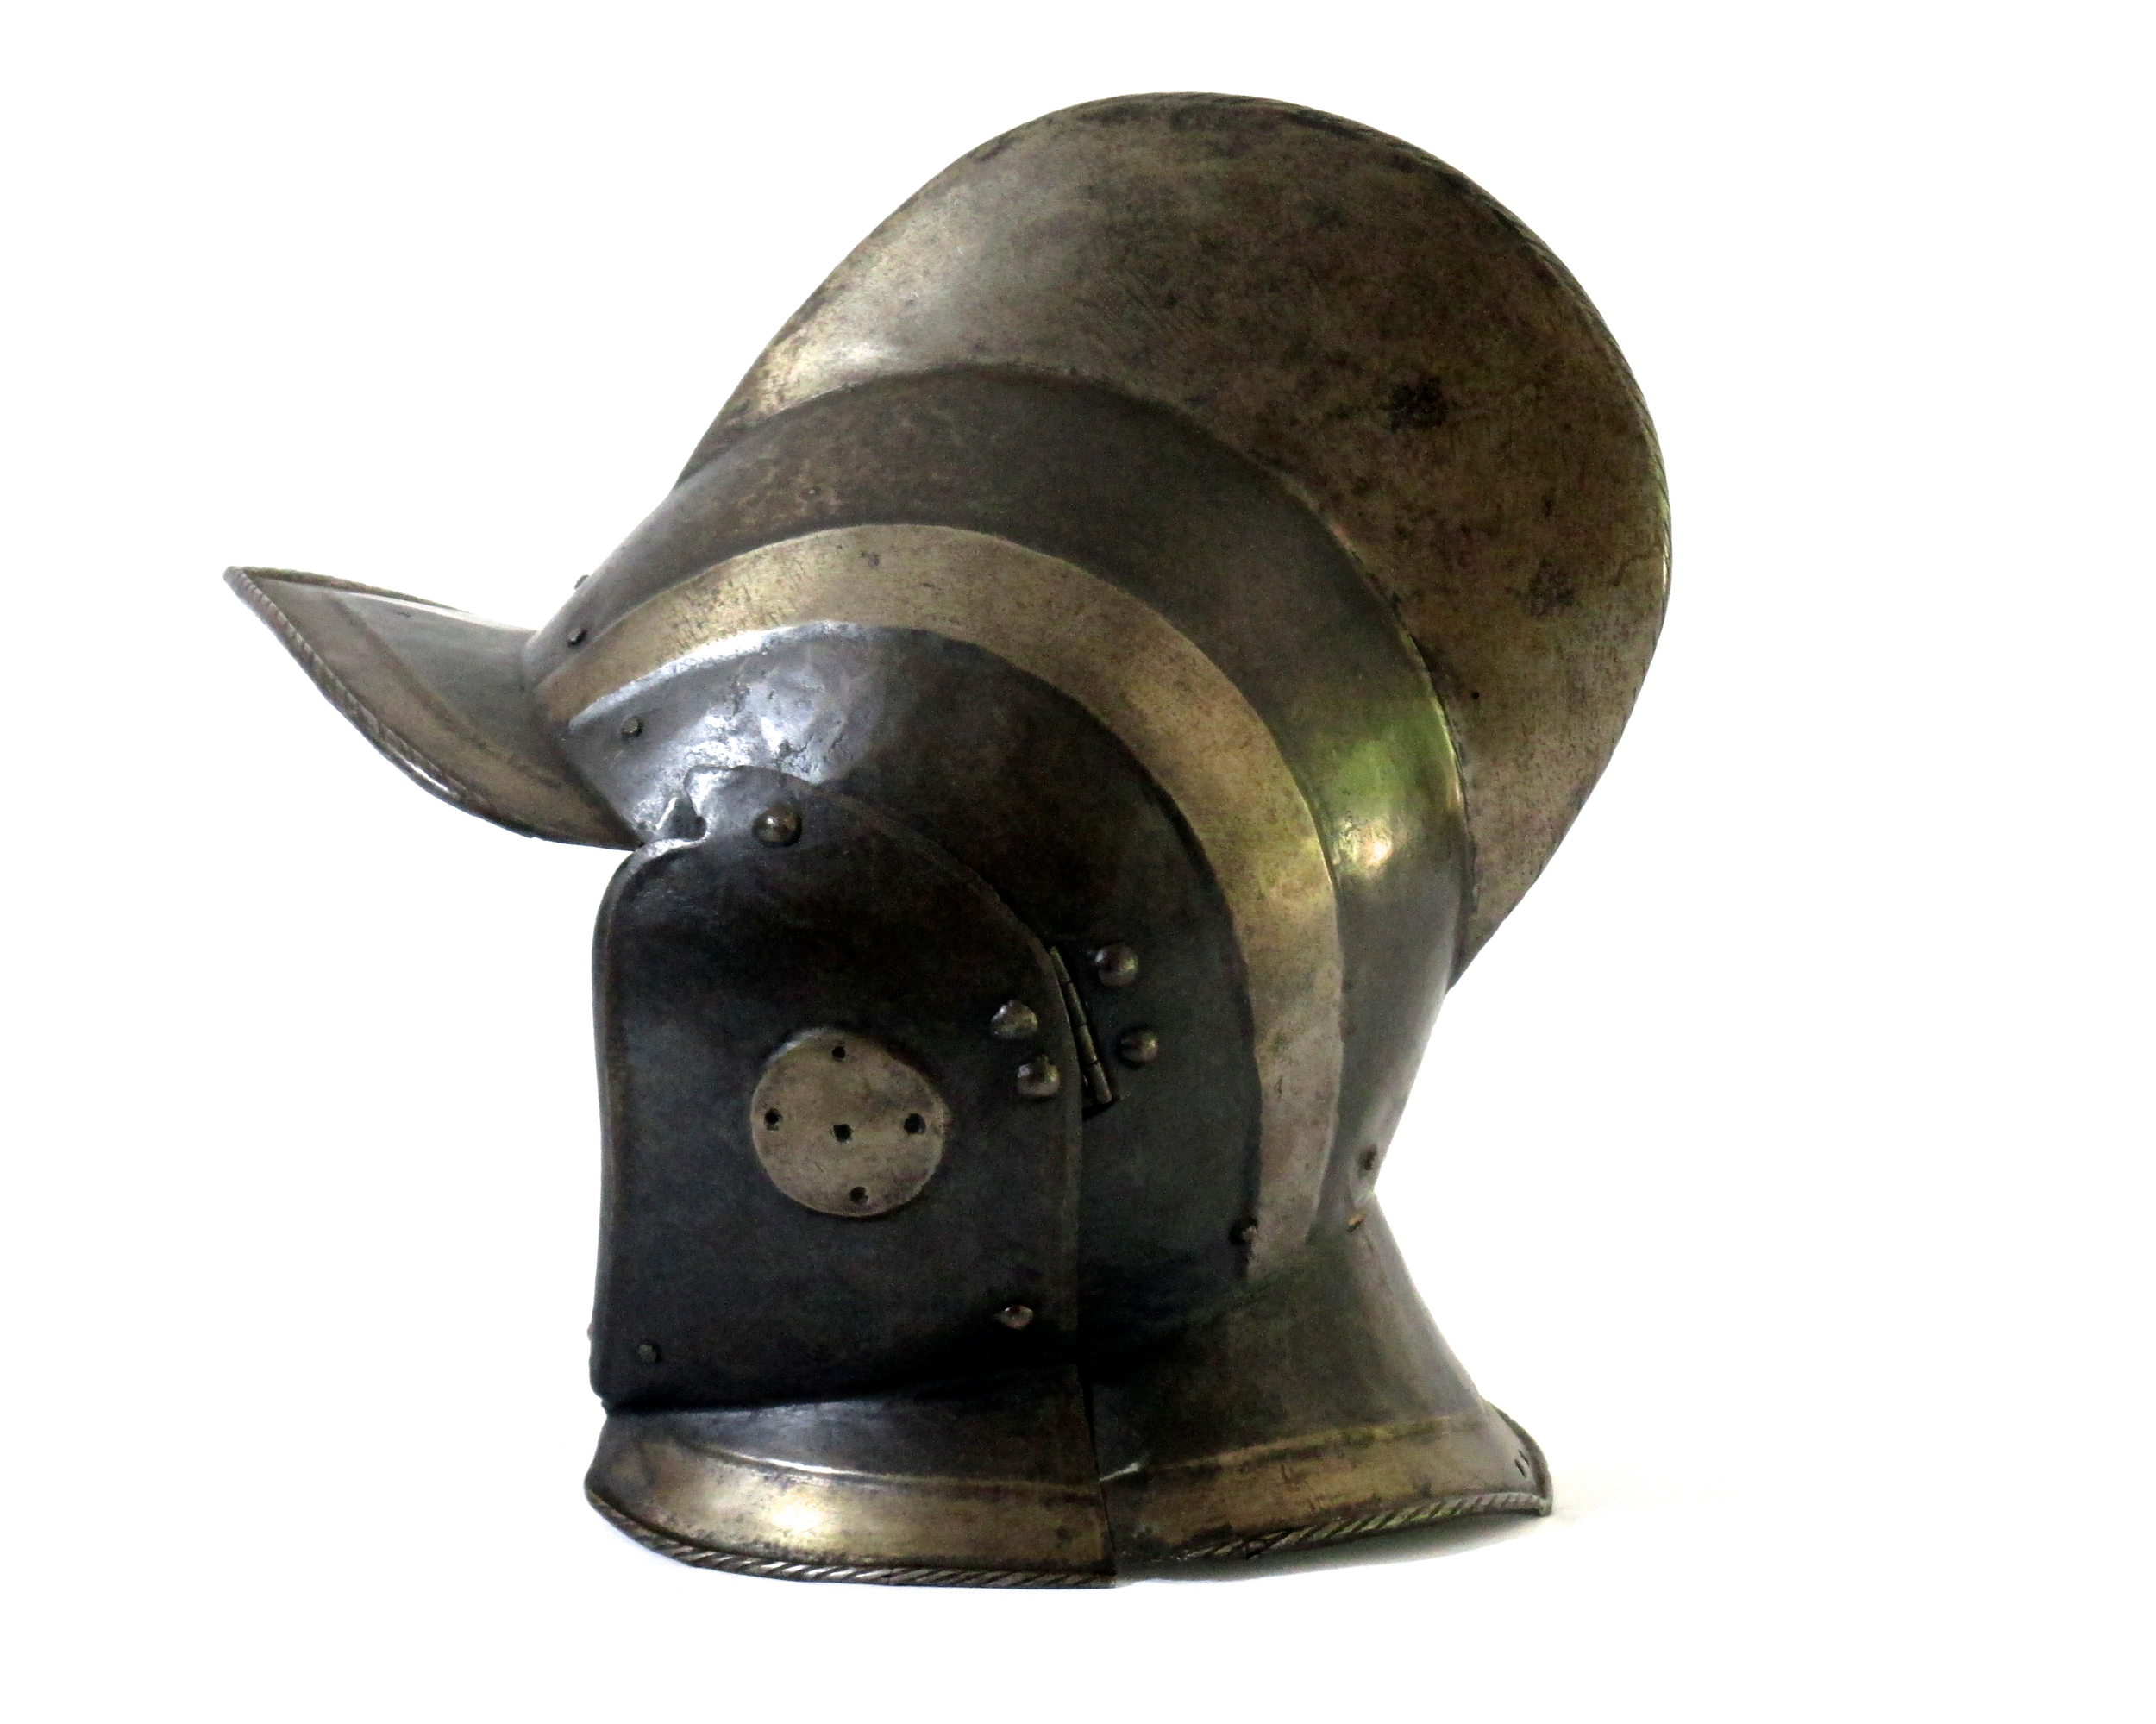 german-black-white-burgonet-helmet-16th-century-gary-friedland-arms-armor4.jpg